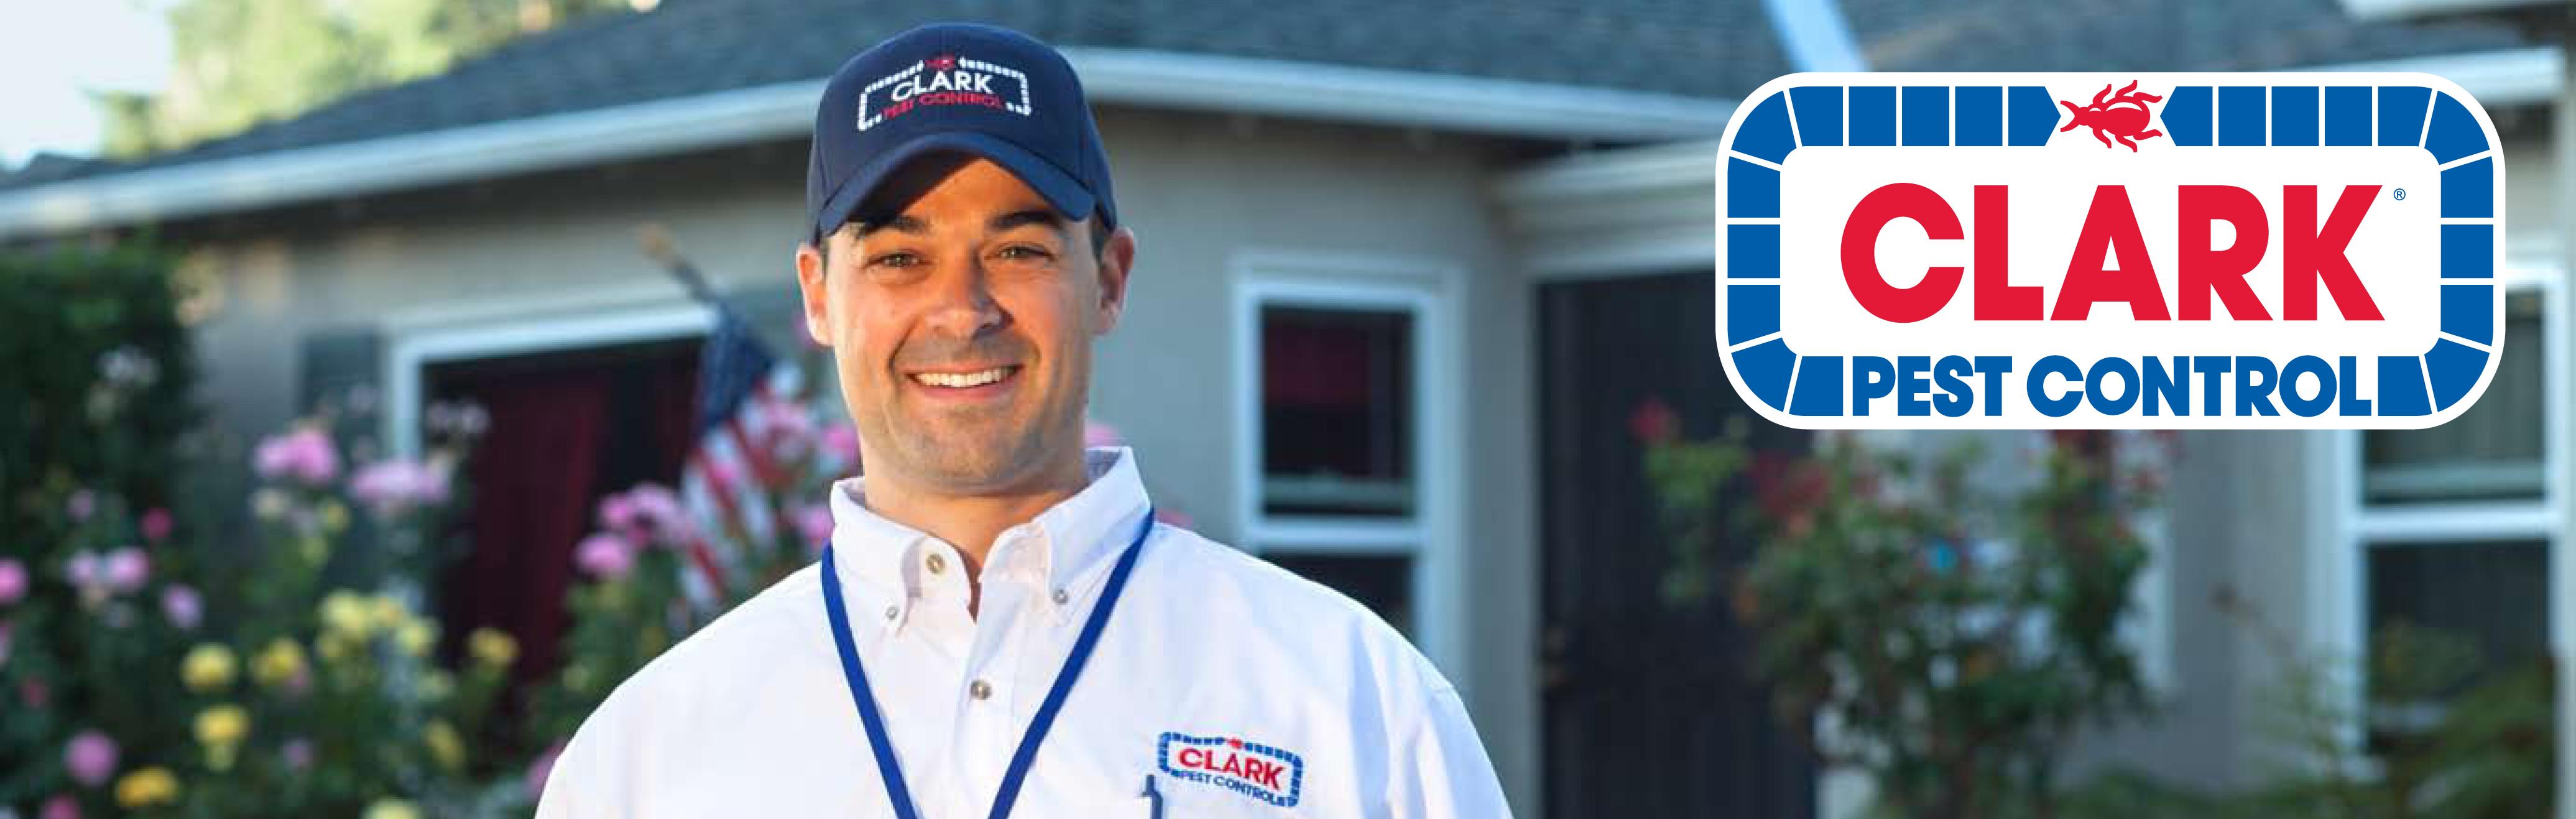 Clark Pest Control Reviews, Ratings | Home & Garden near 1220 W. Betteravia Rd. , Santa Maria CA